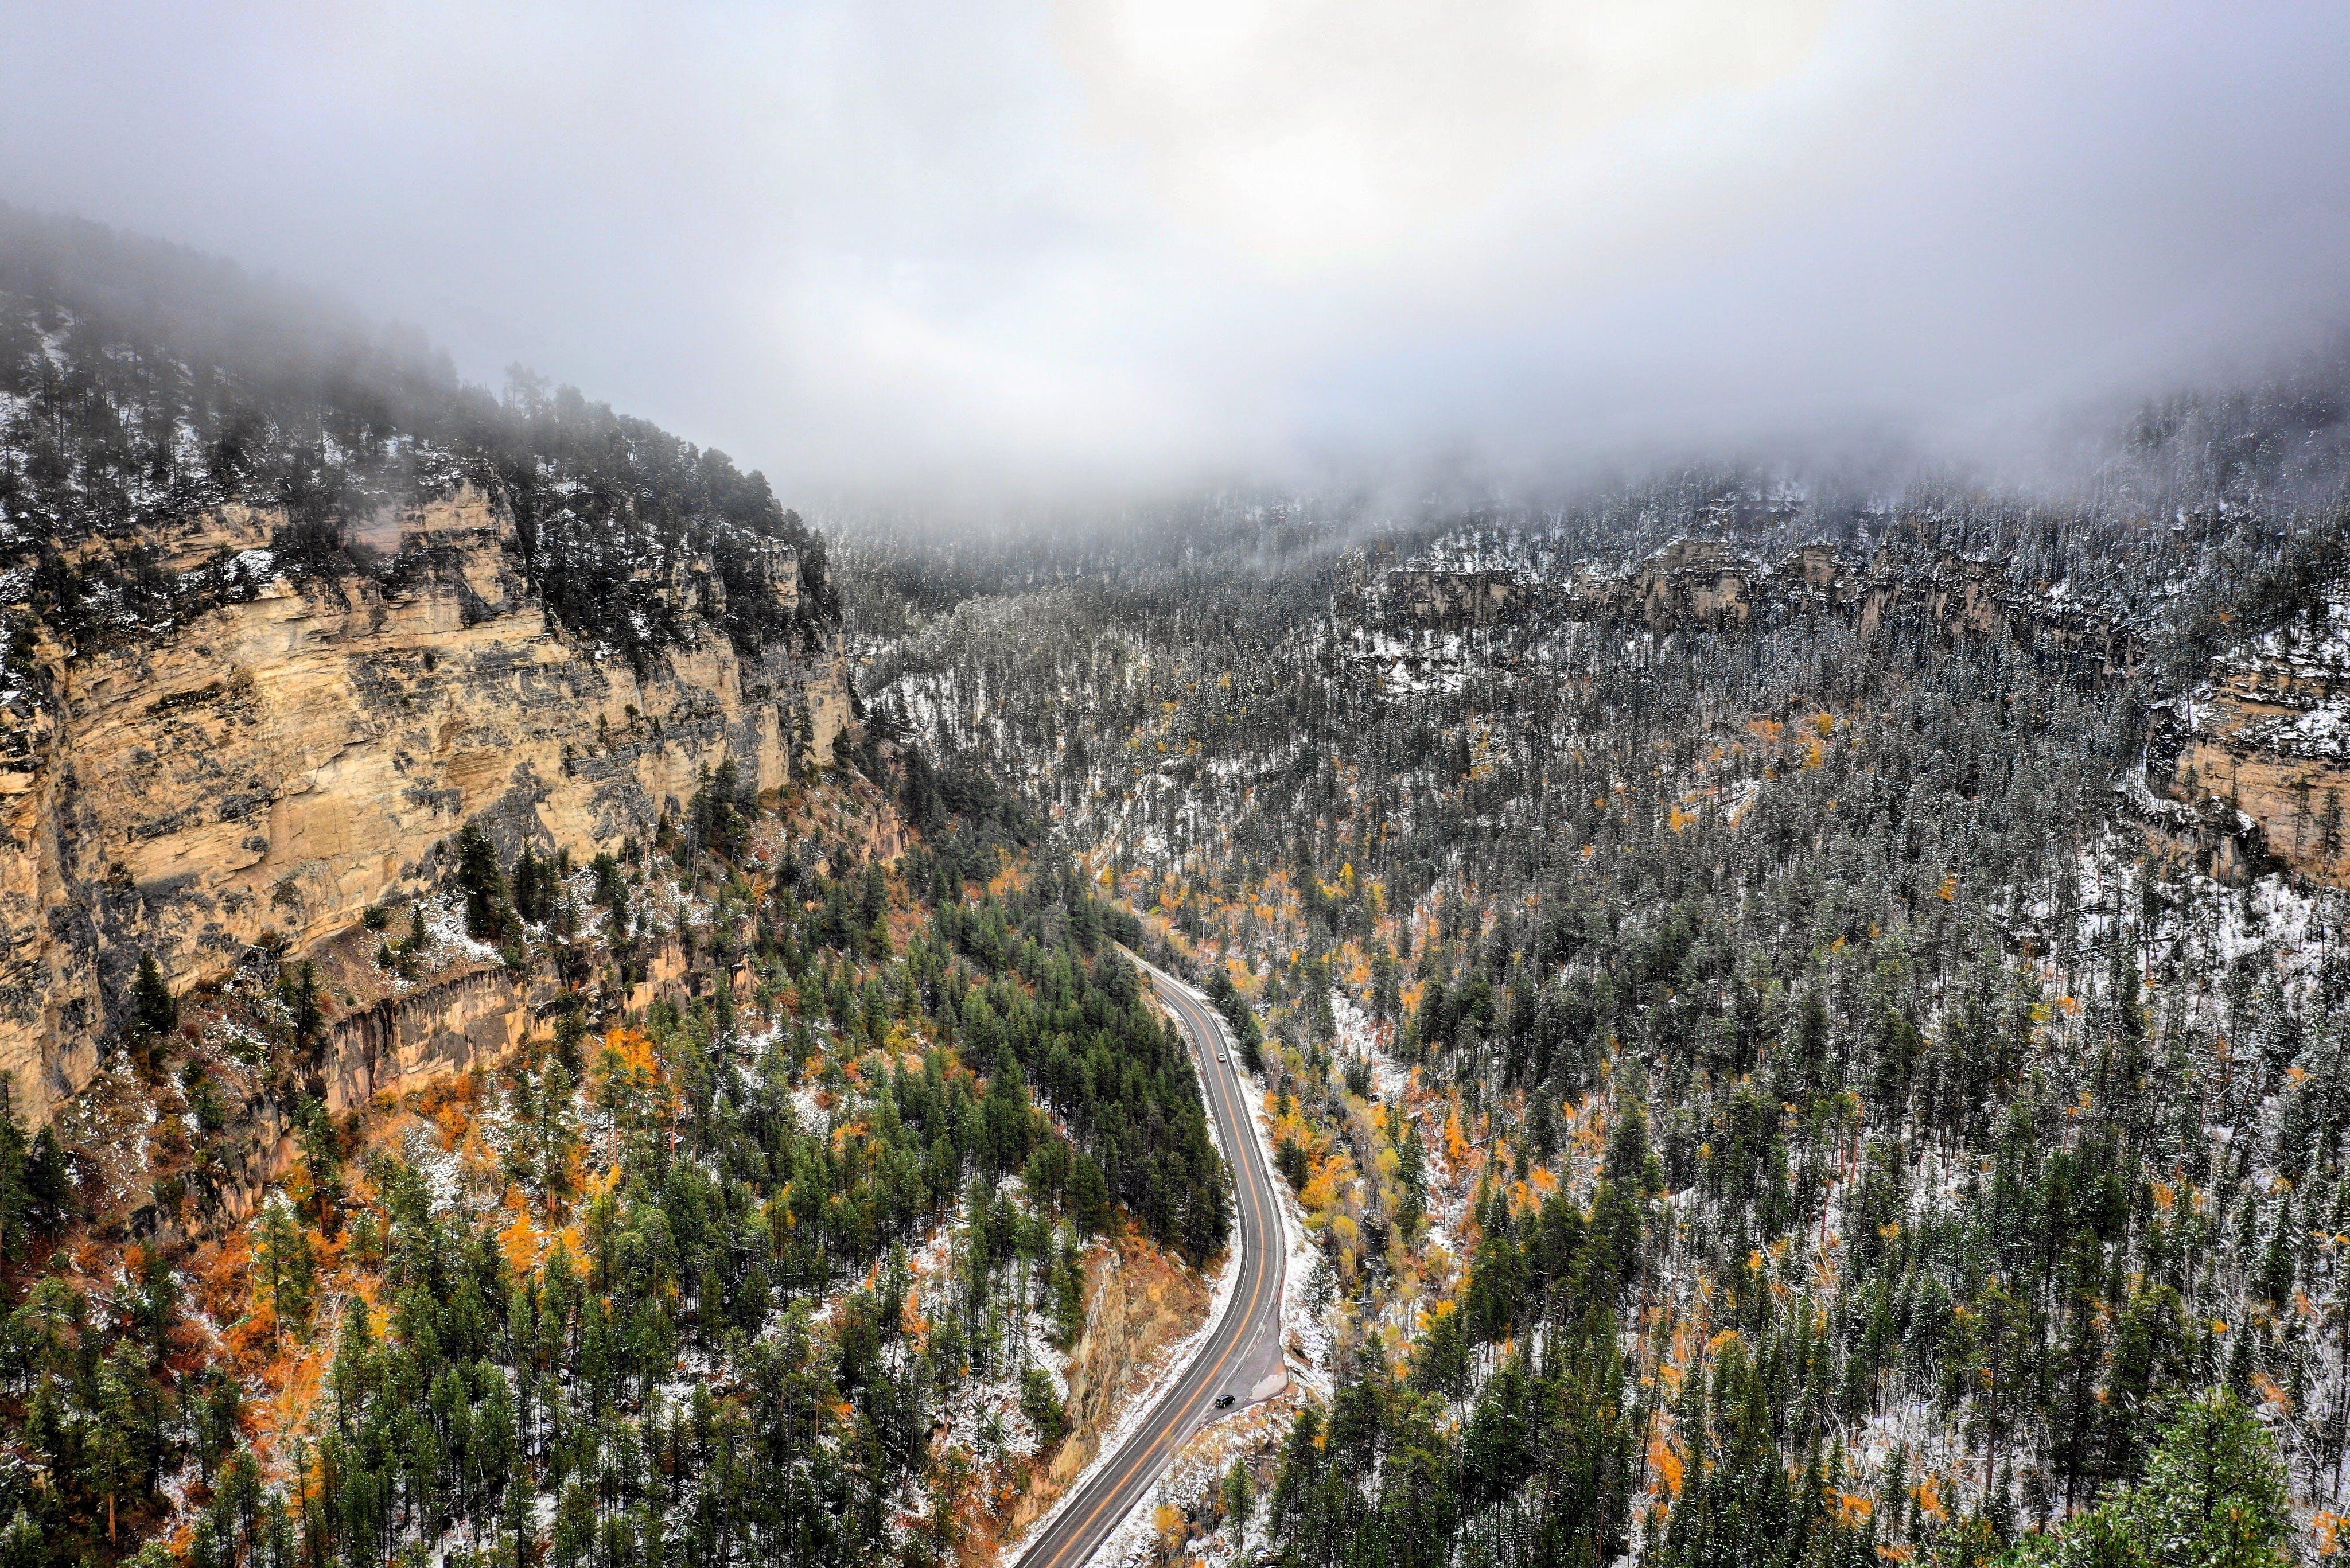 Grey Road Near Green-leafed Trees